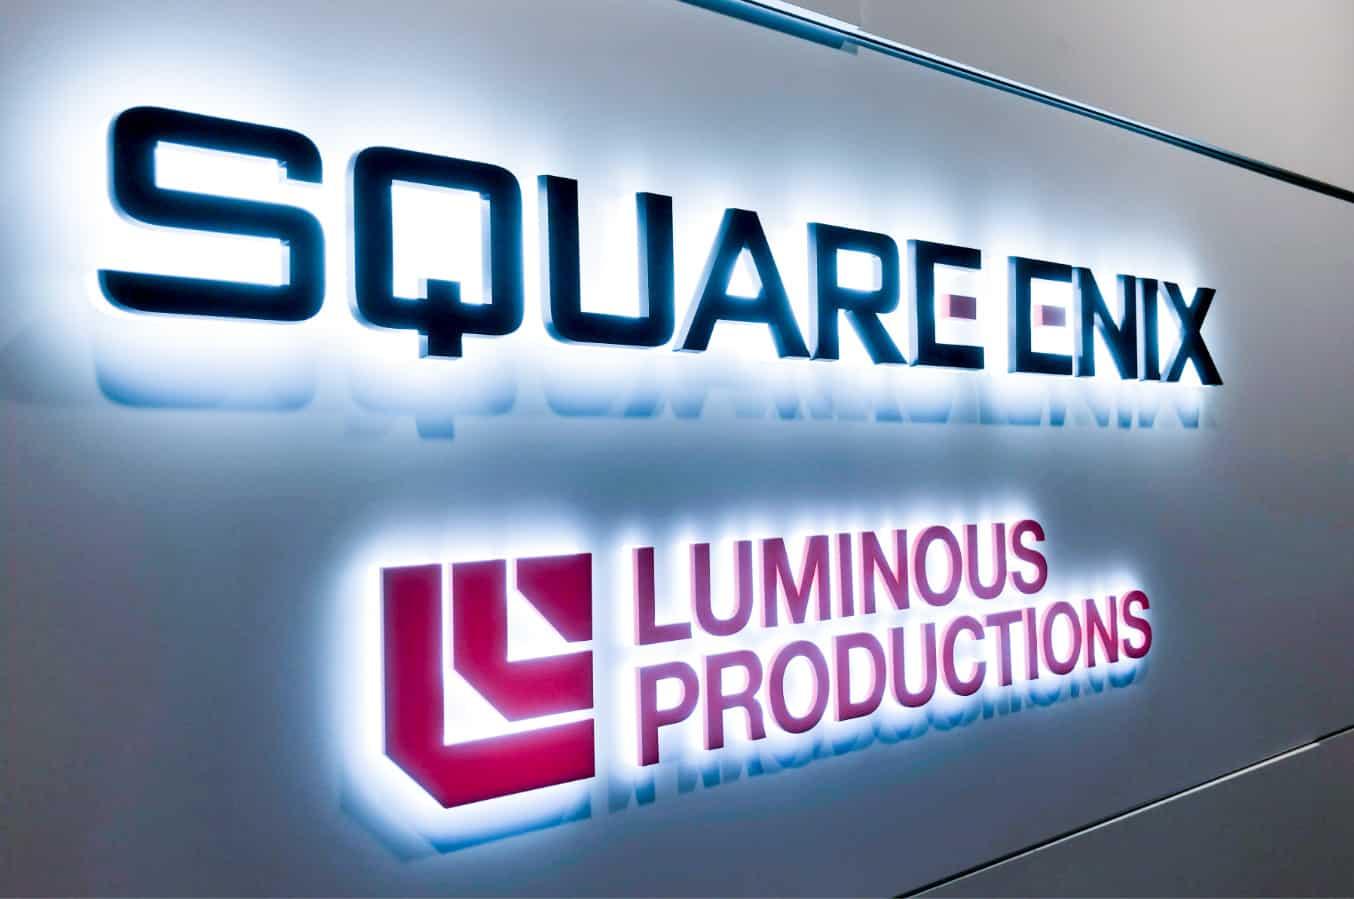 Luminous Productions : les ambitions du studio AAA de Square Enix